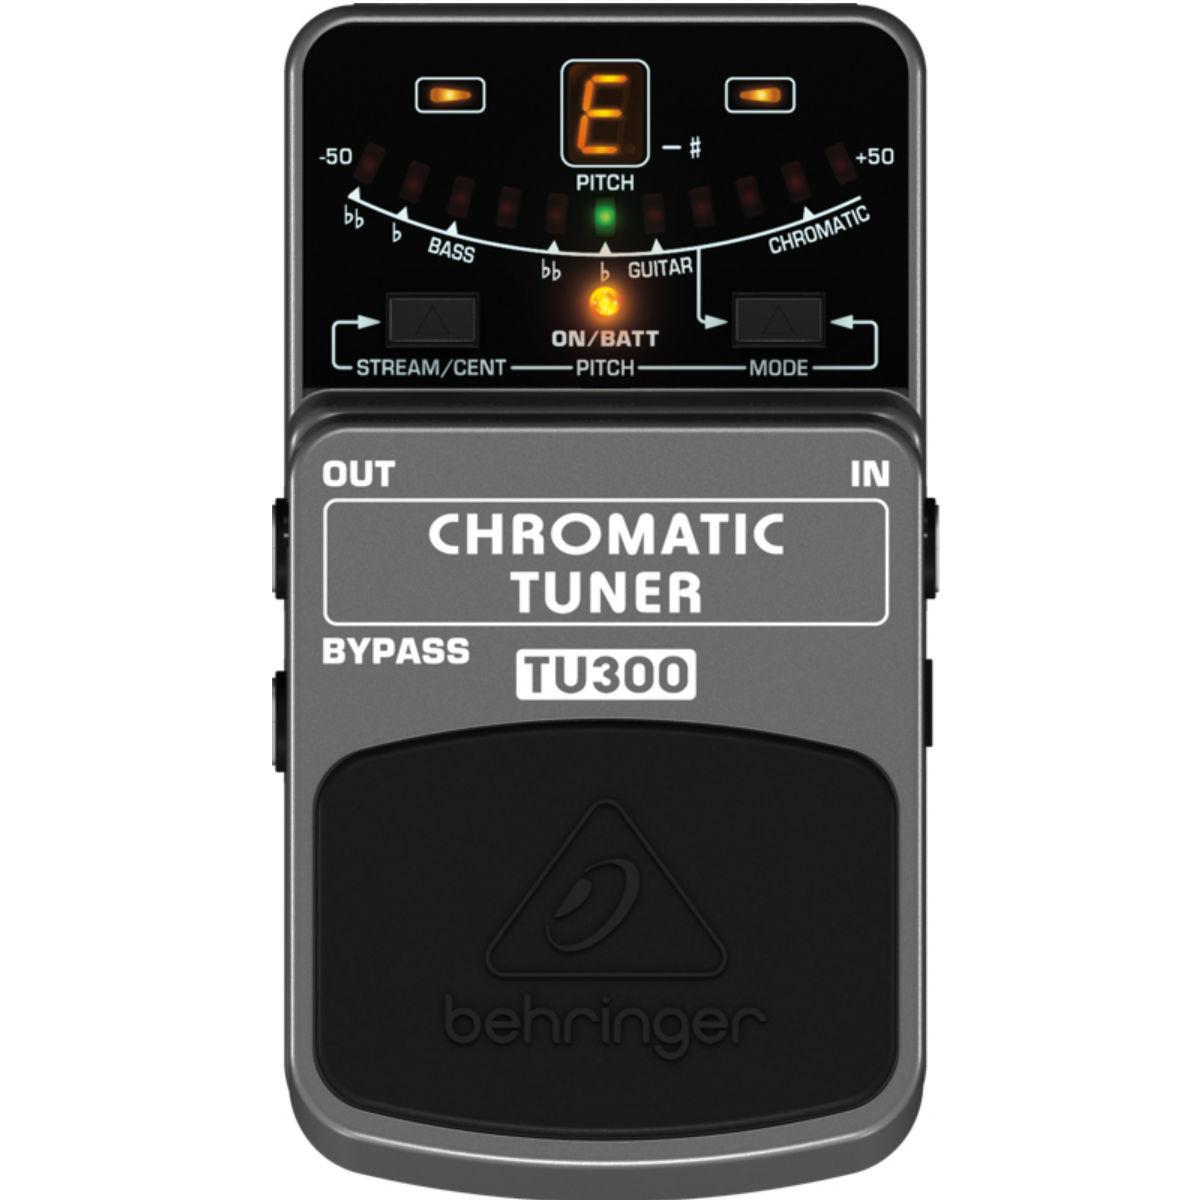 Pedal Afinador Behringer TU300 - Chromatic Tuner